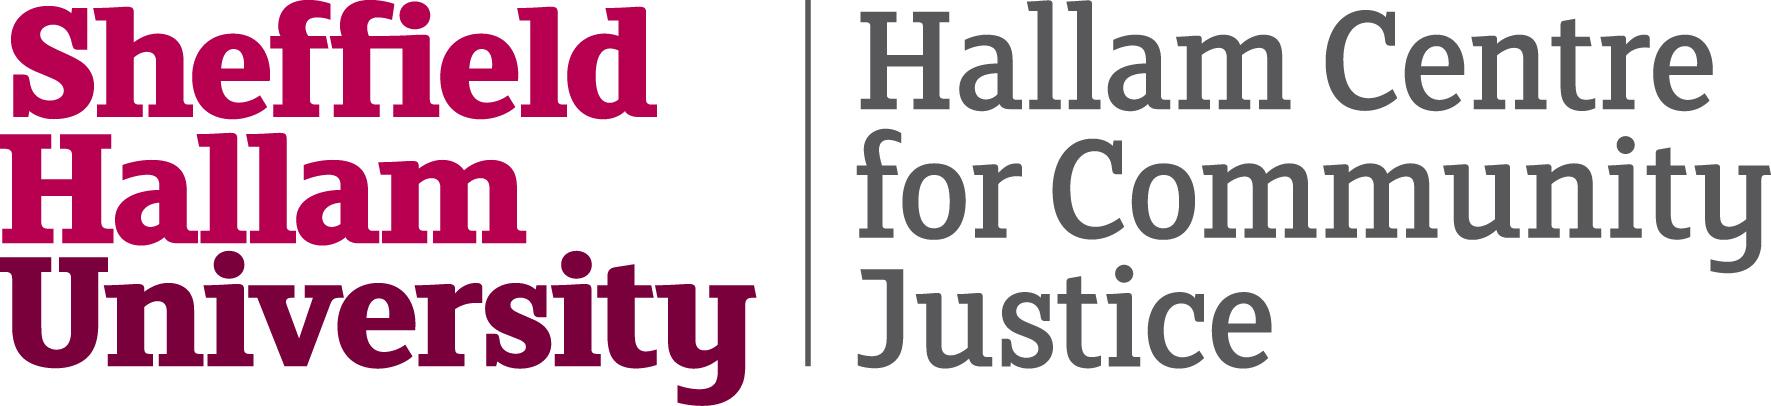 HCCJ Logo